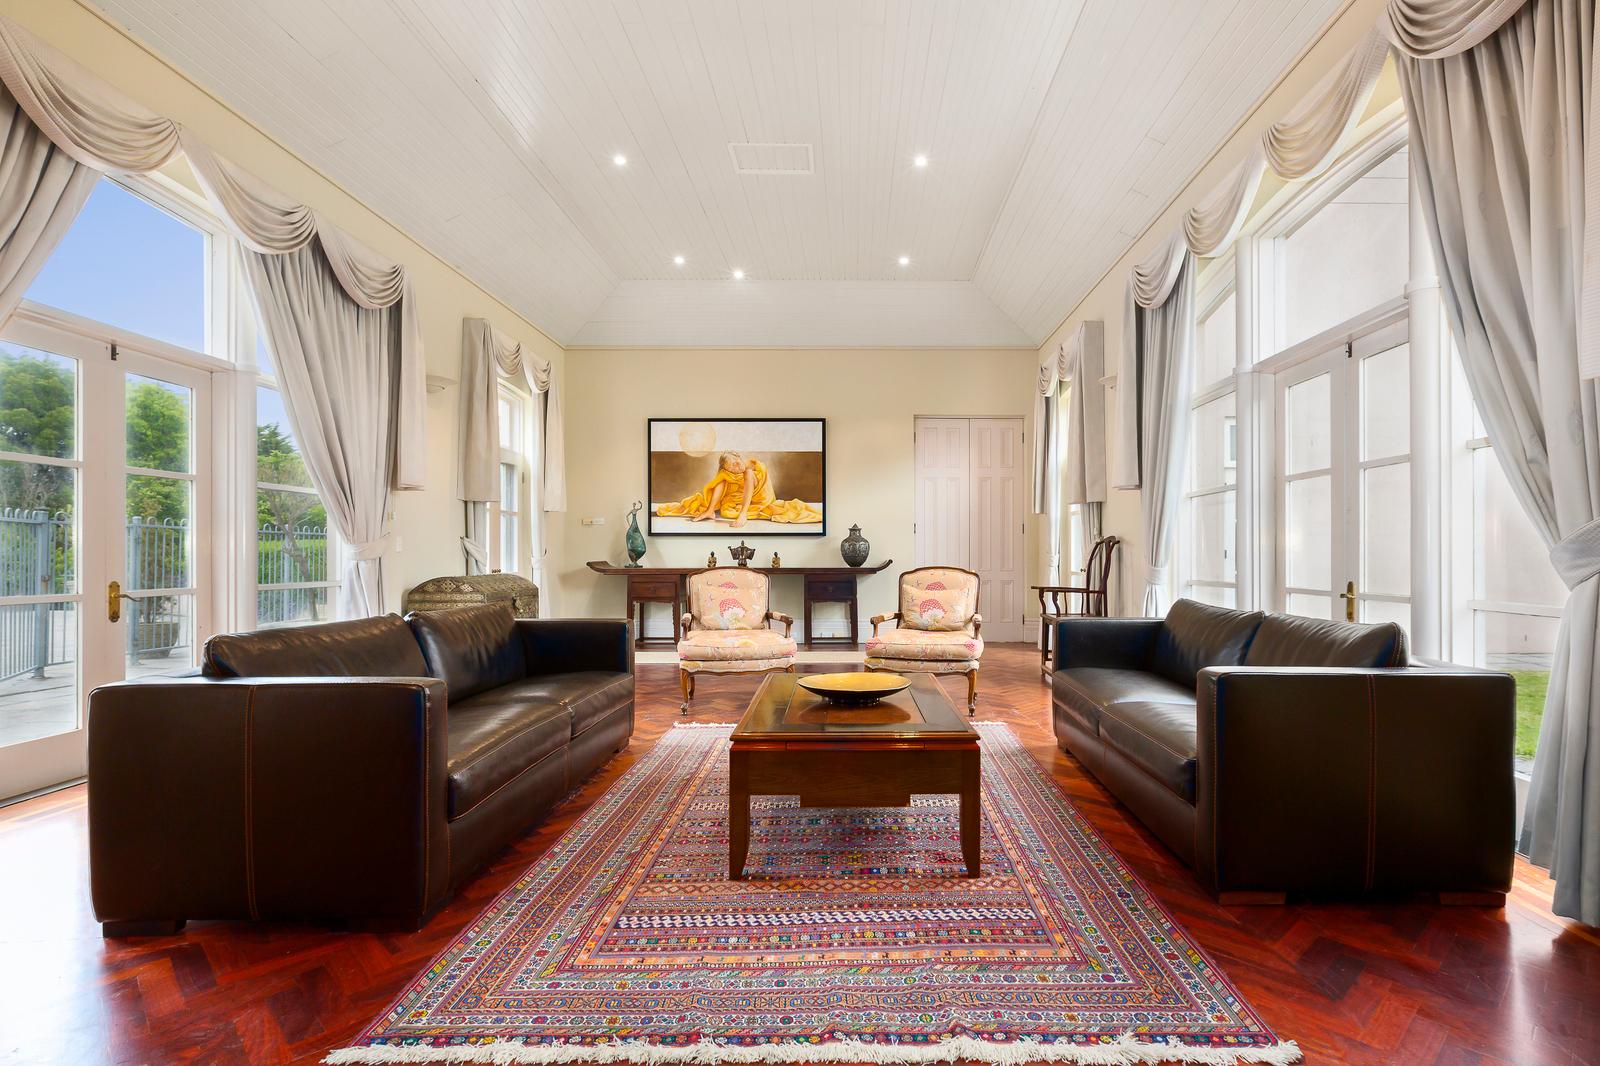 3880 Frankston-Flinders Road,Shoreham 3916 - Image 10